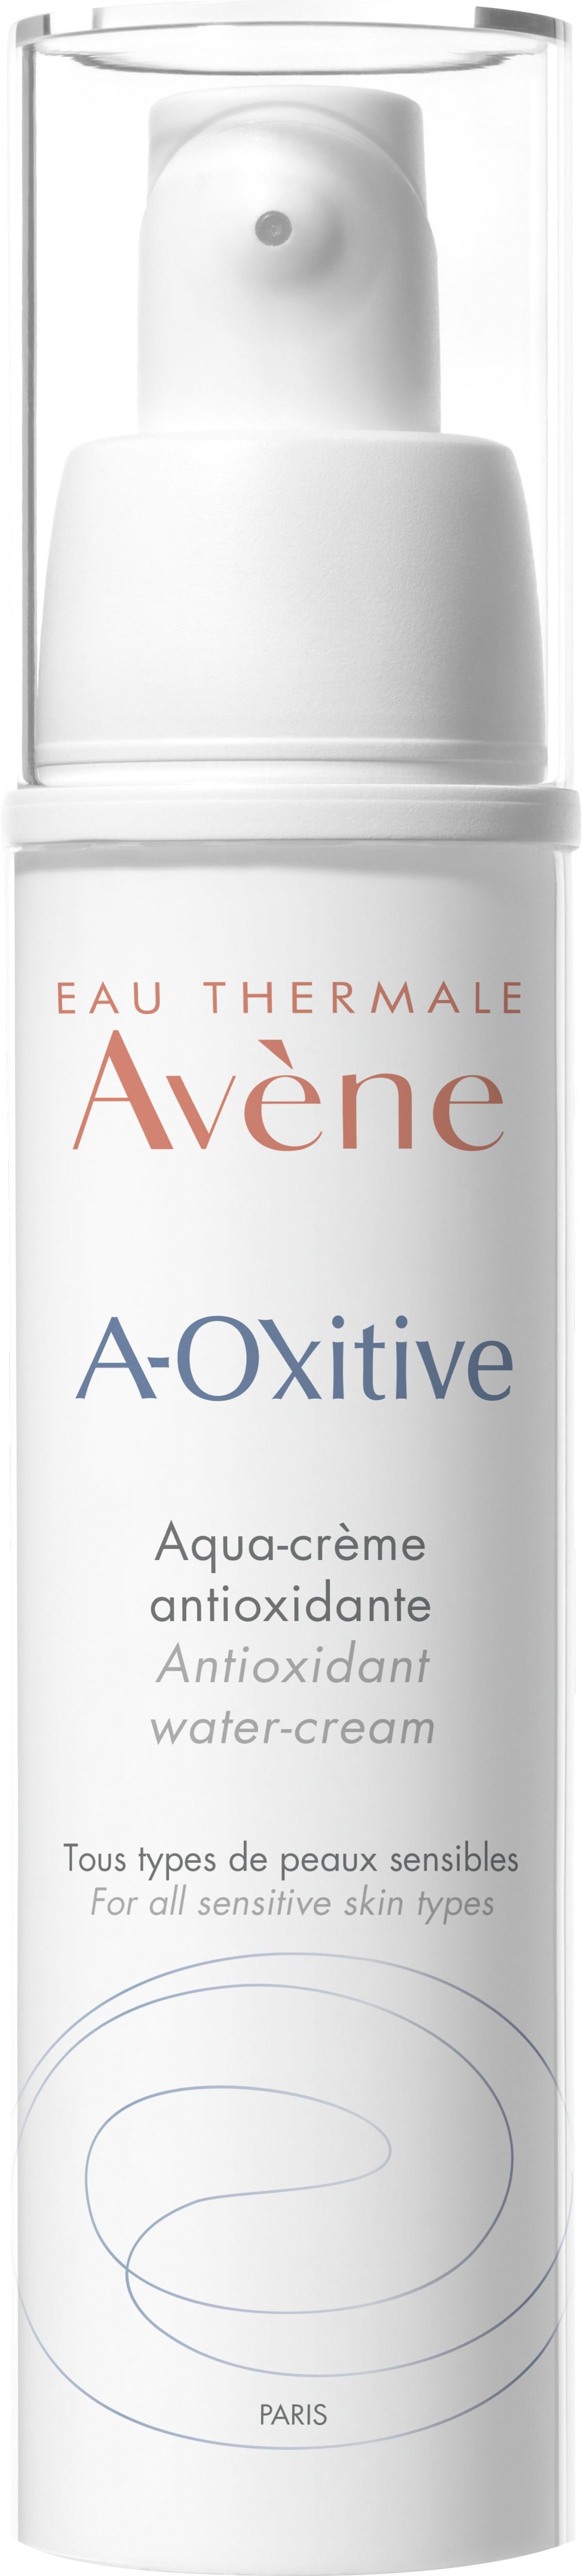 Avene A-Oxitive Antioxidant Water Cream